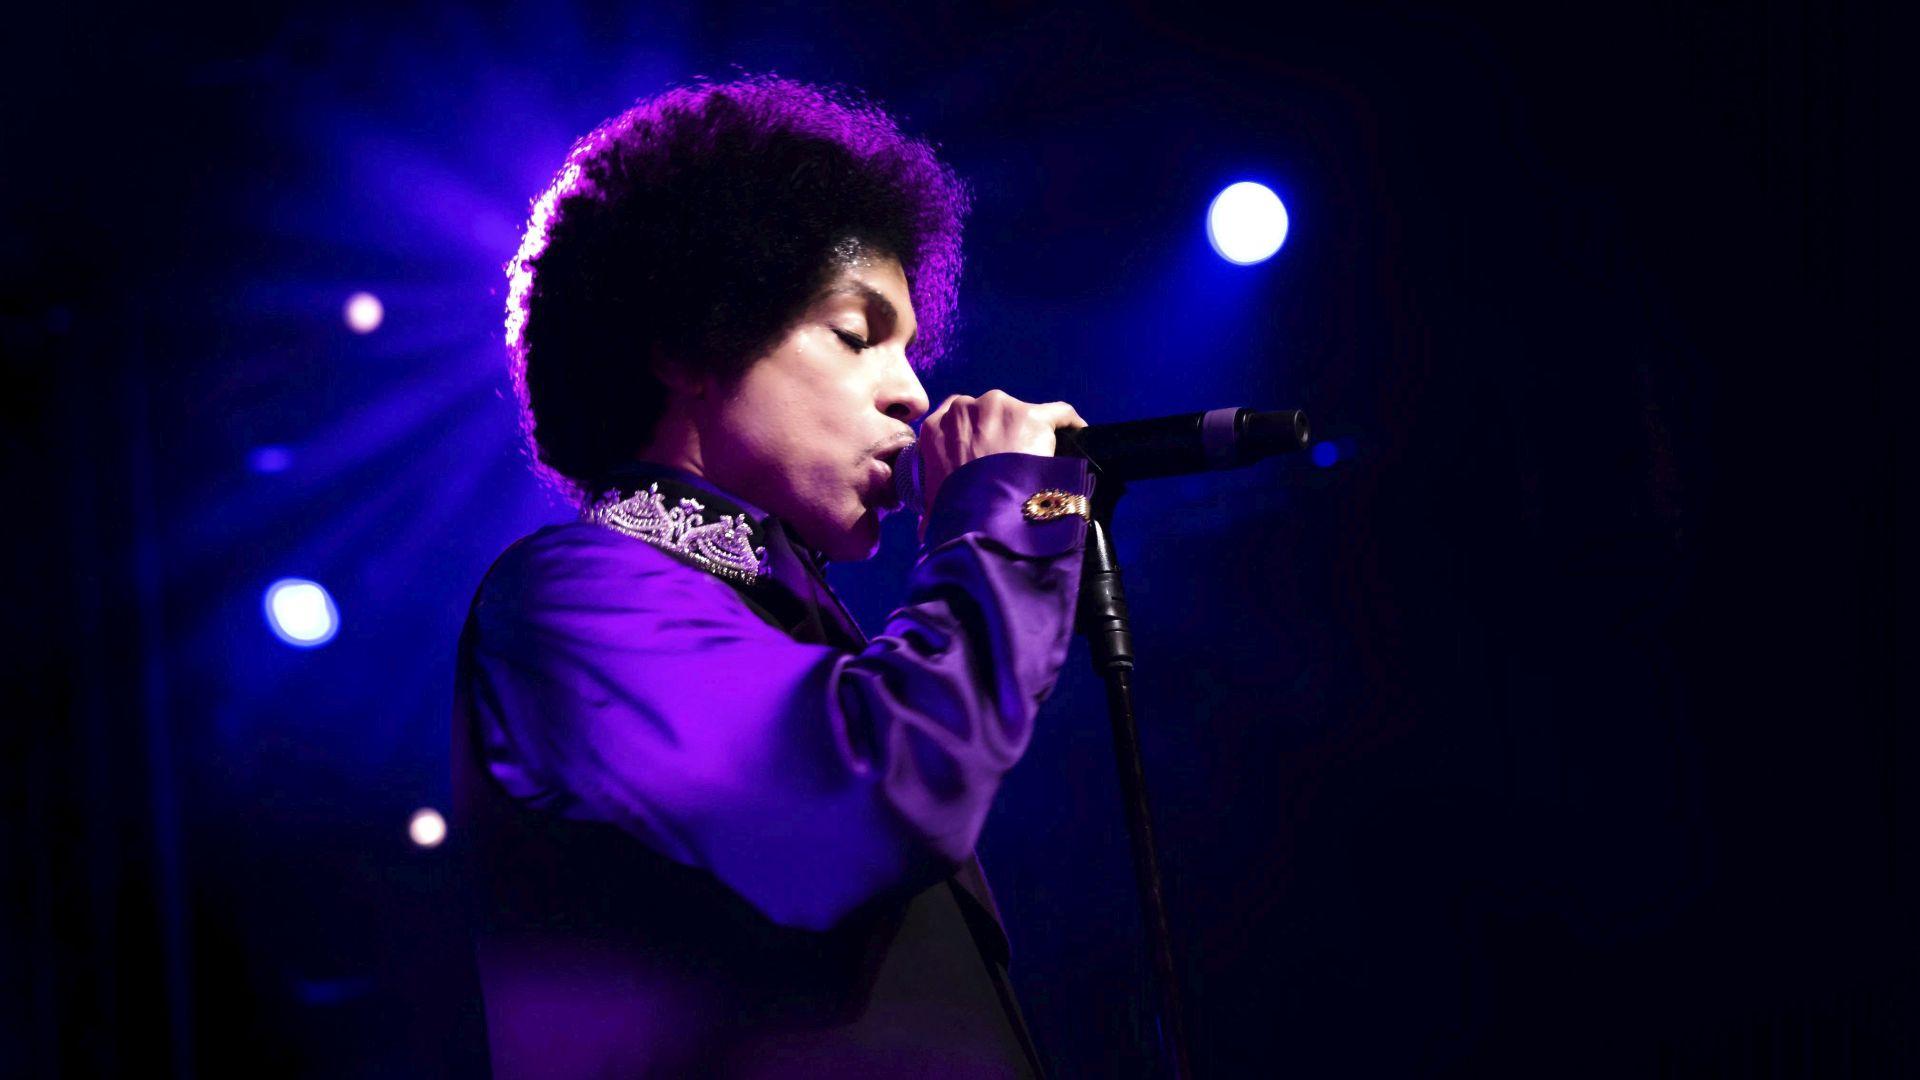 POTVRĐENO Prince preminuo od predoziranja